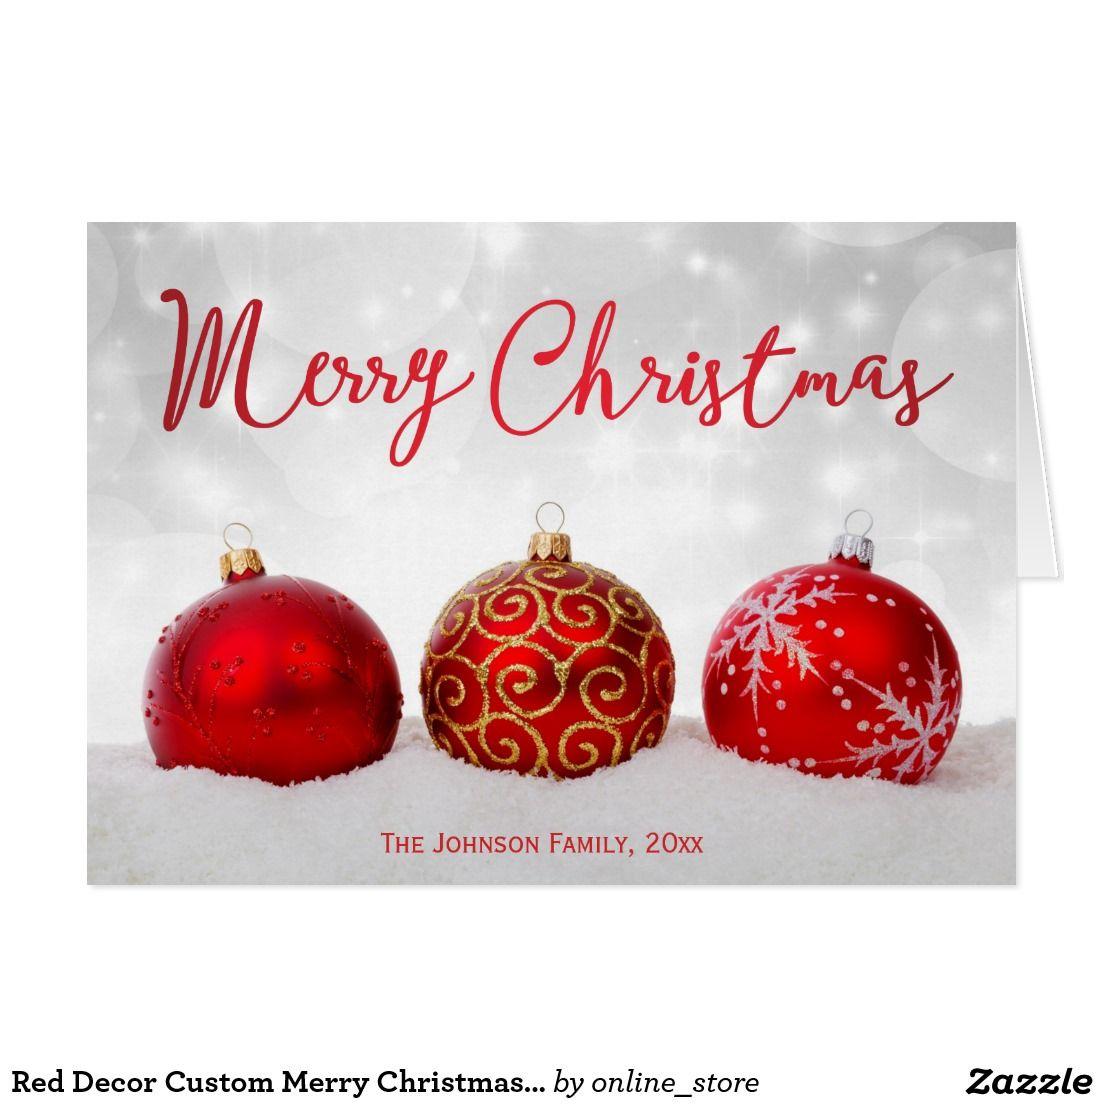 Red Decor Custom Merry Christmas Greeting Cards